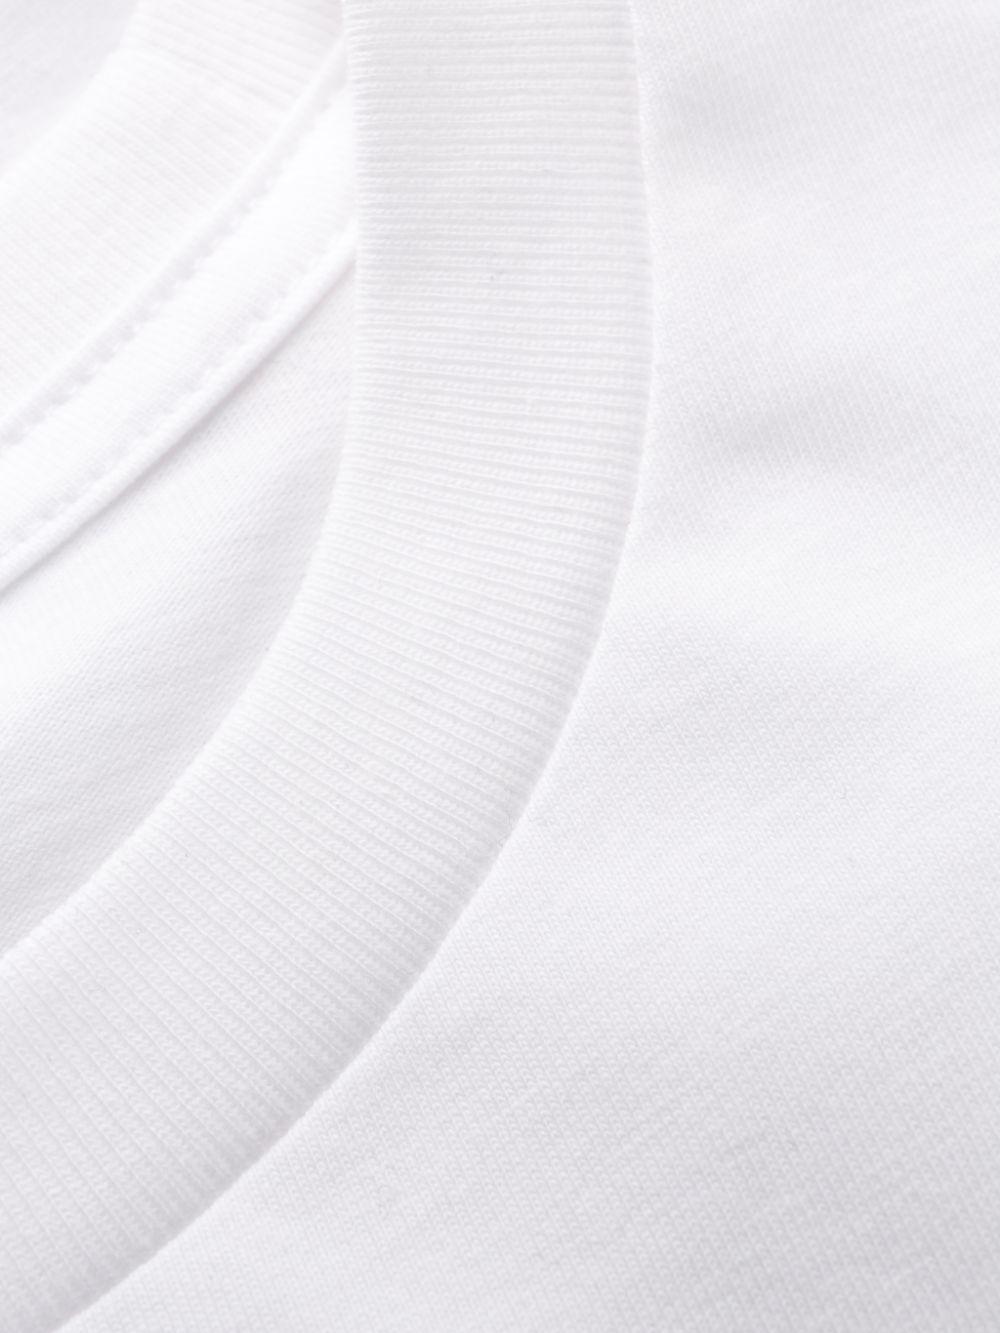 t-shirt taschino uomo bianca in cotone CARHARTT WIP | T-shirt | I02209102.XX